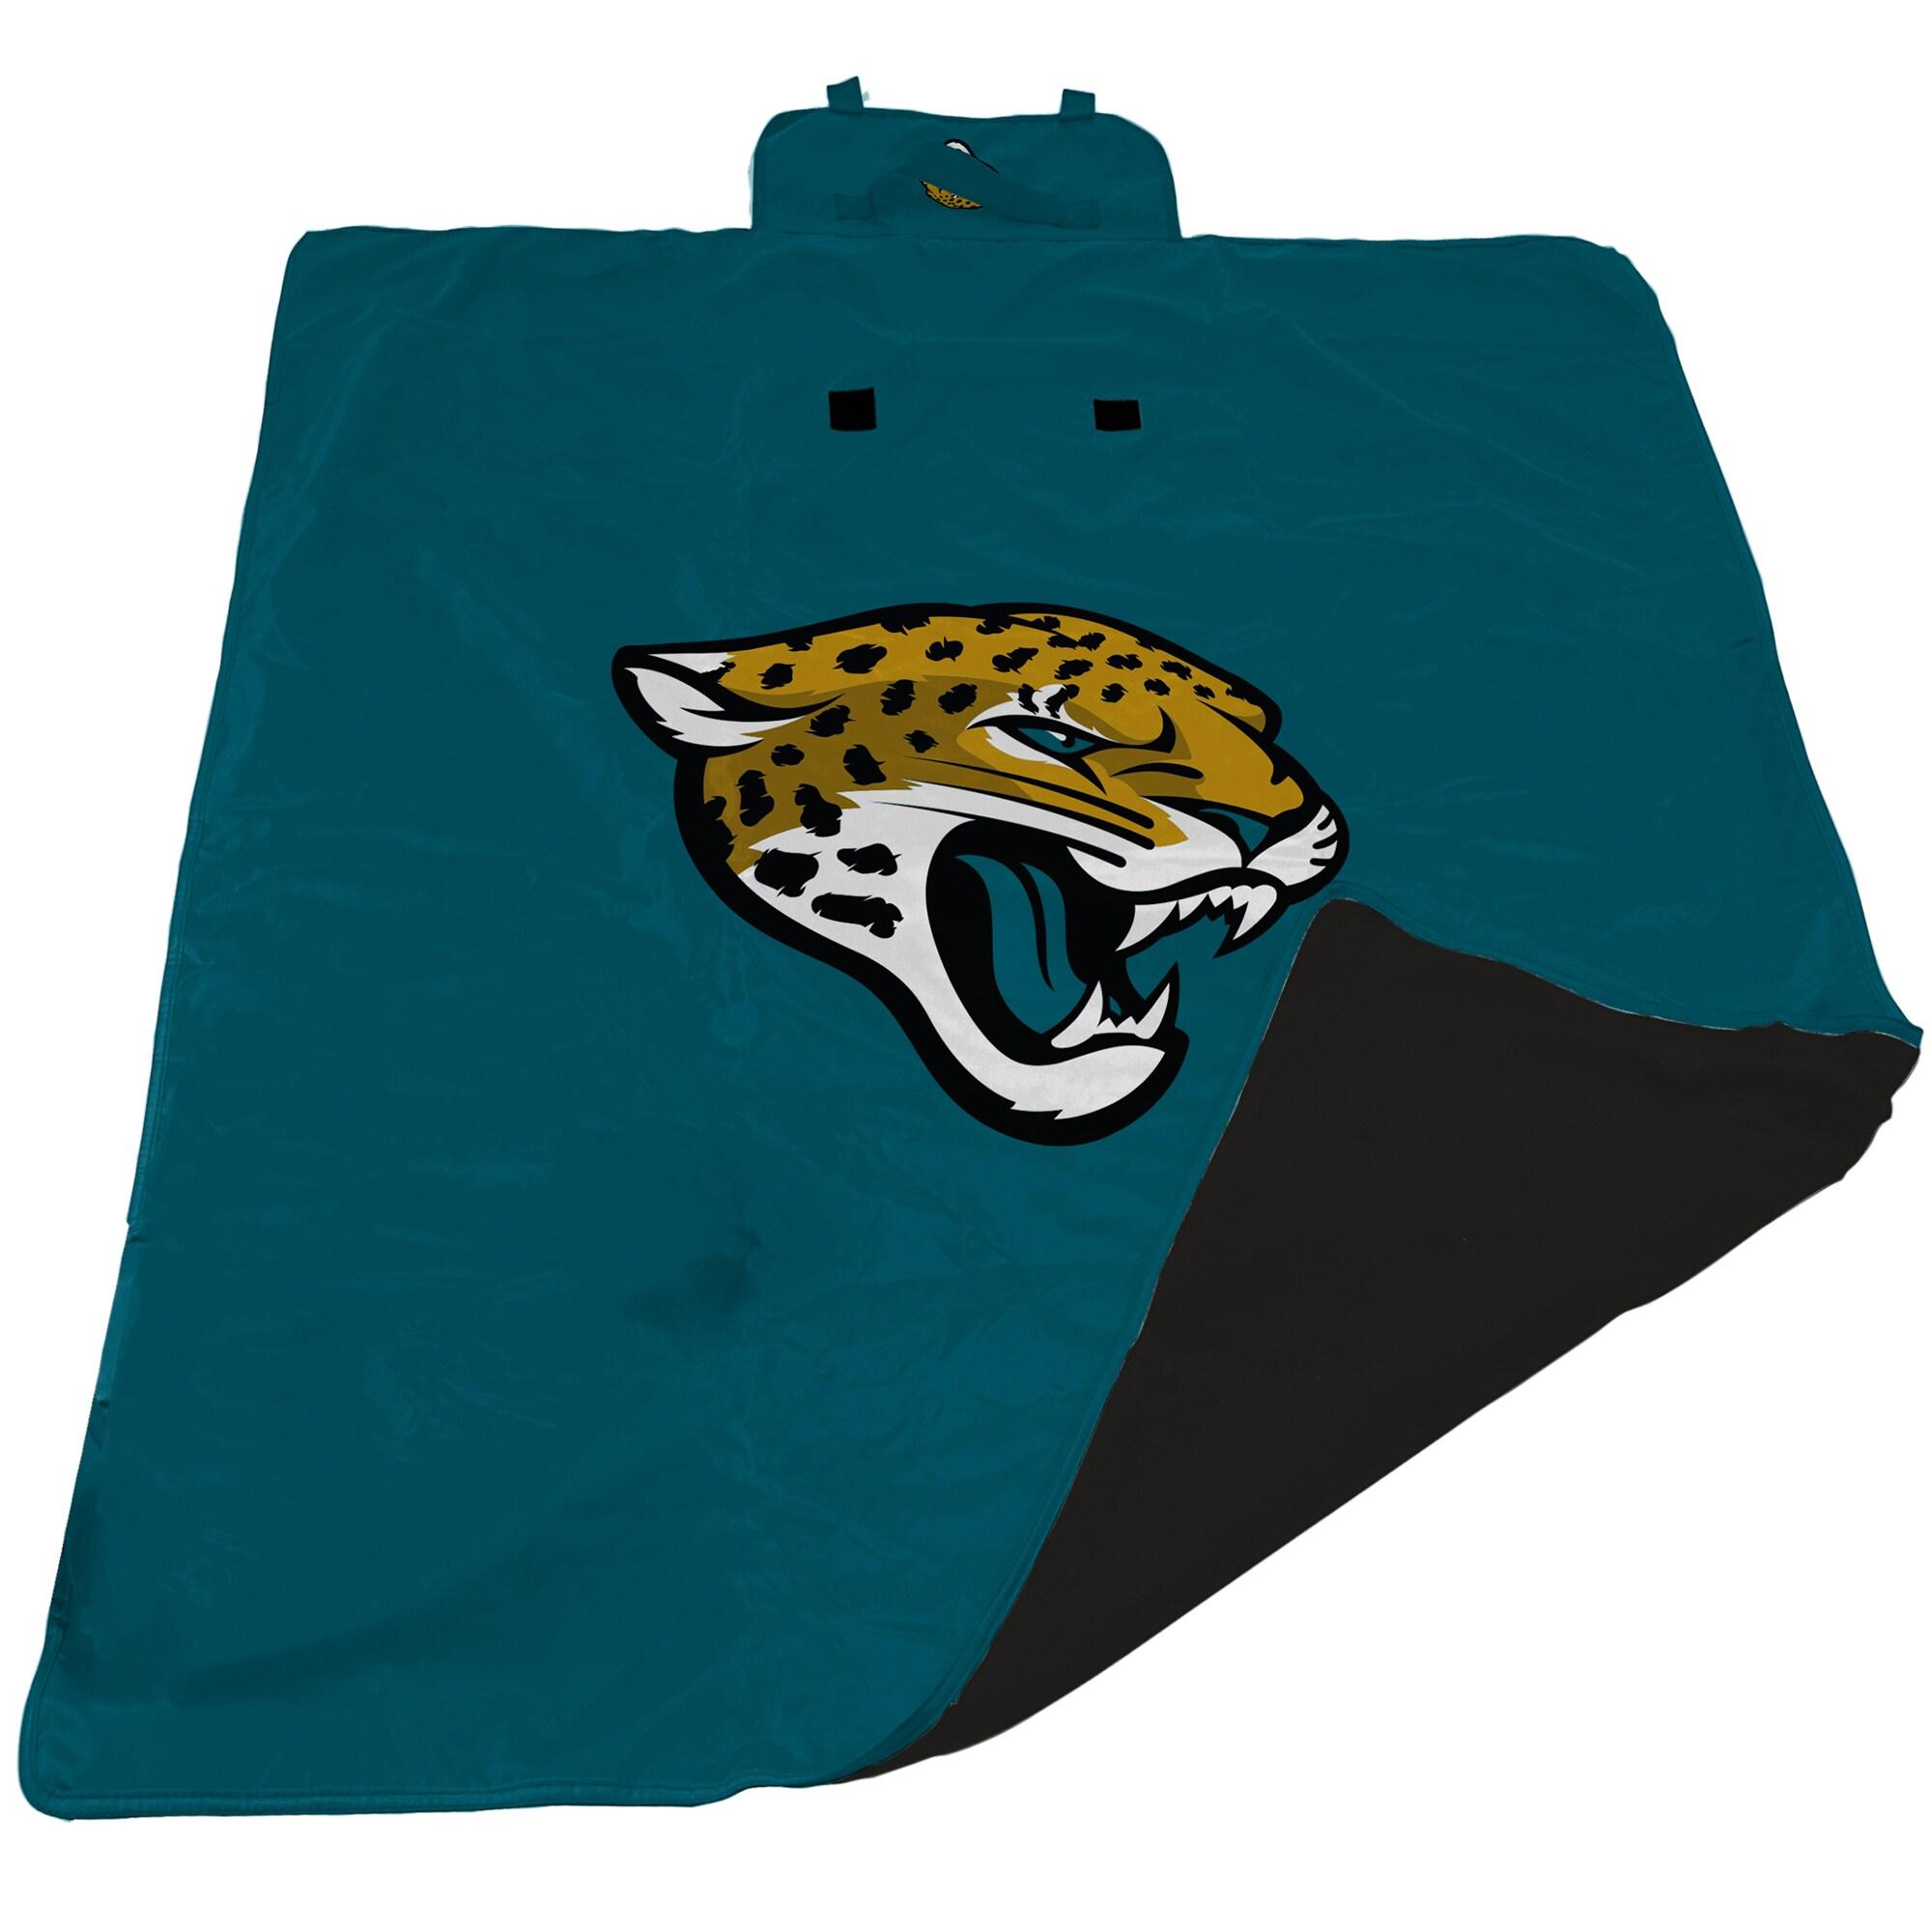 Jacksonville Jaguars 60'' x 80'' All-Weather XL Outdoor Blanket - Teal